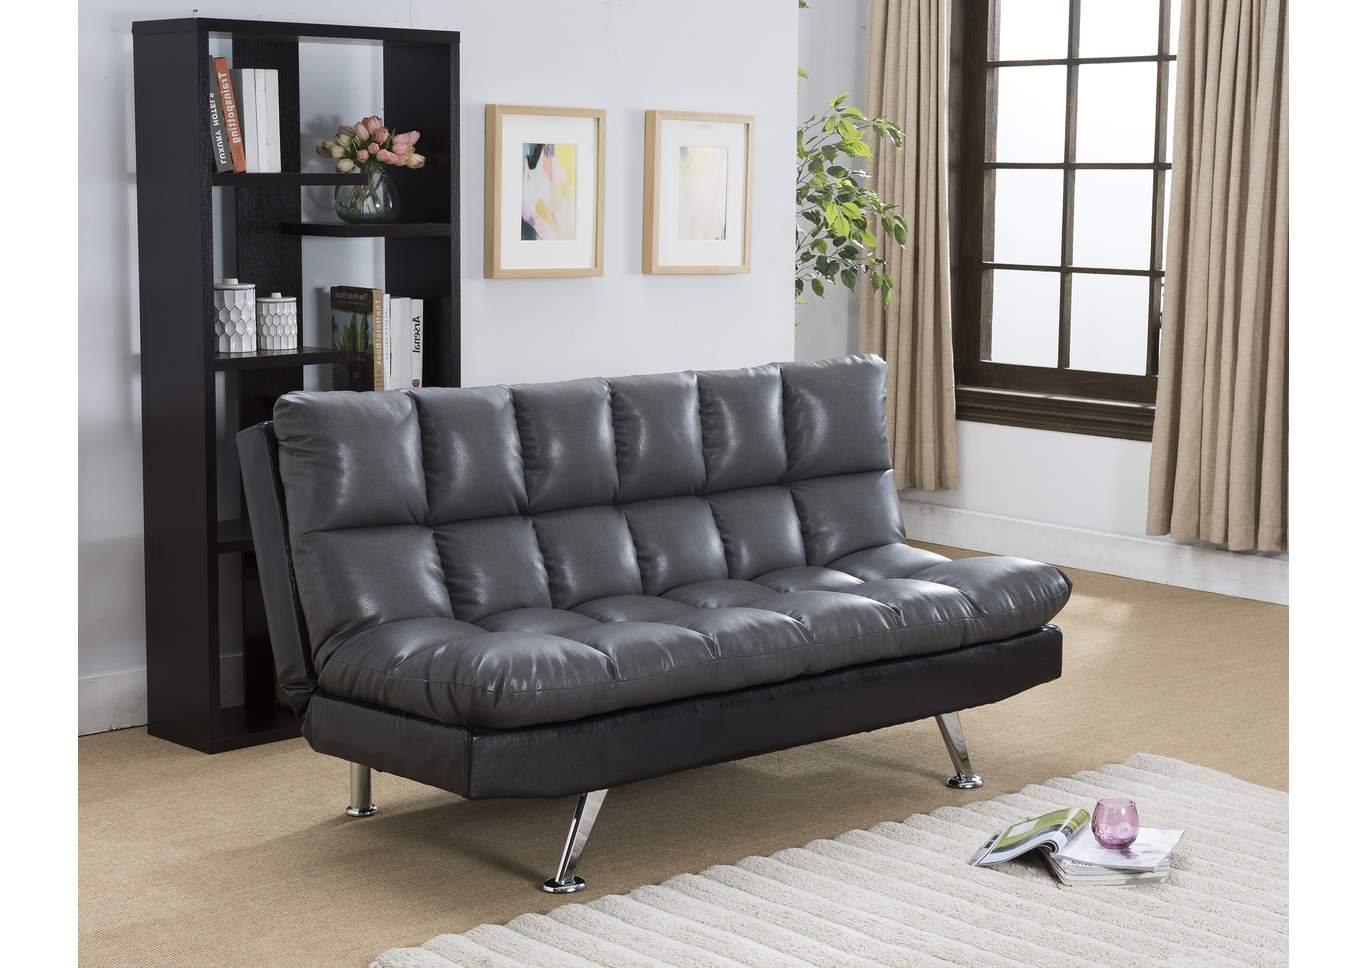 Genial Sundown Black/Grey Adjustable Sofa,Crown Mark